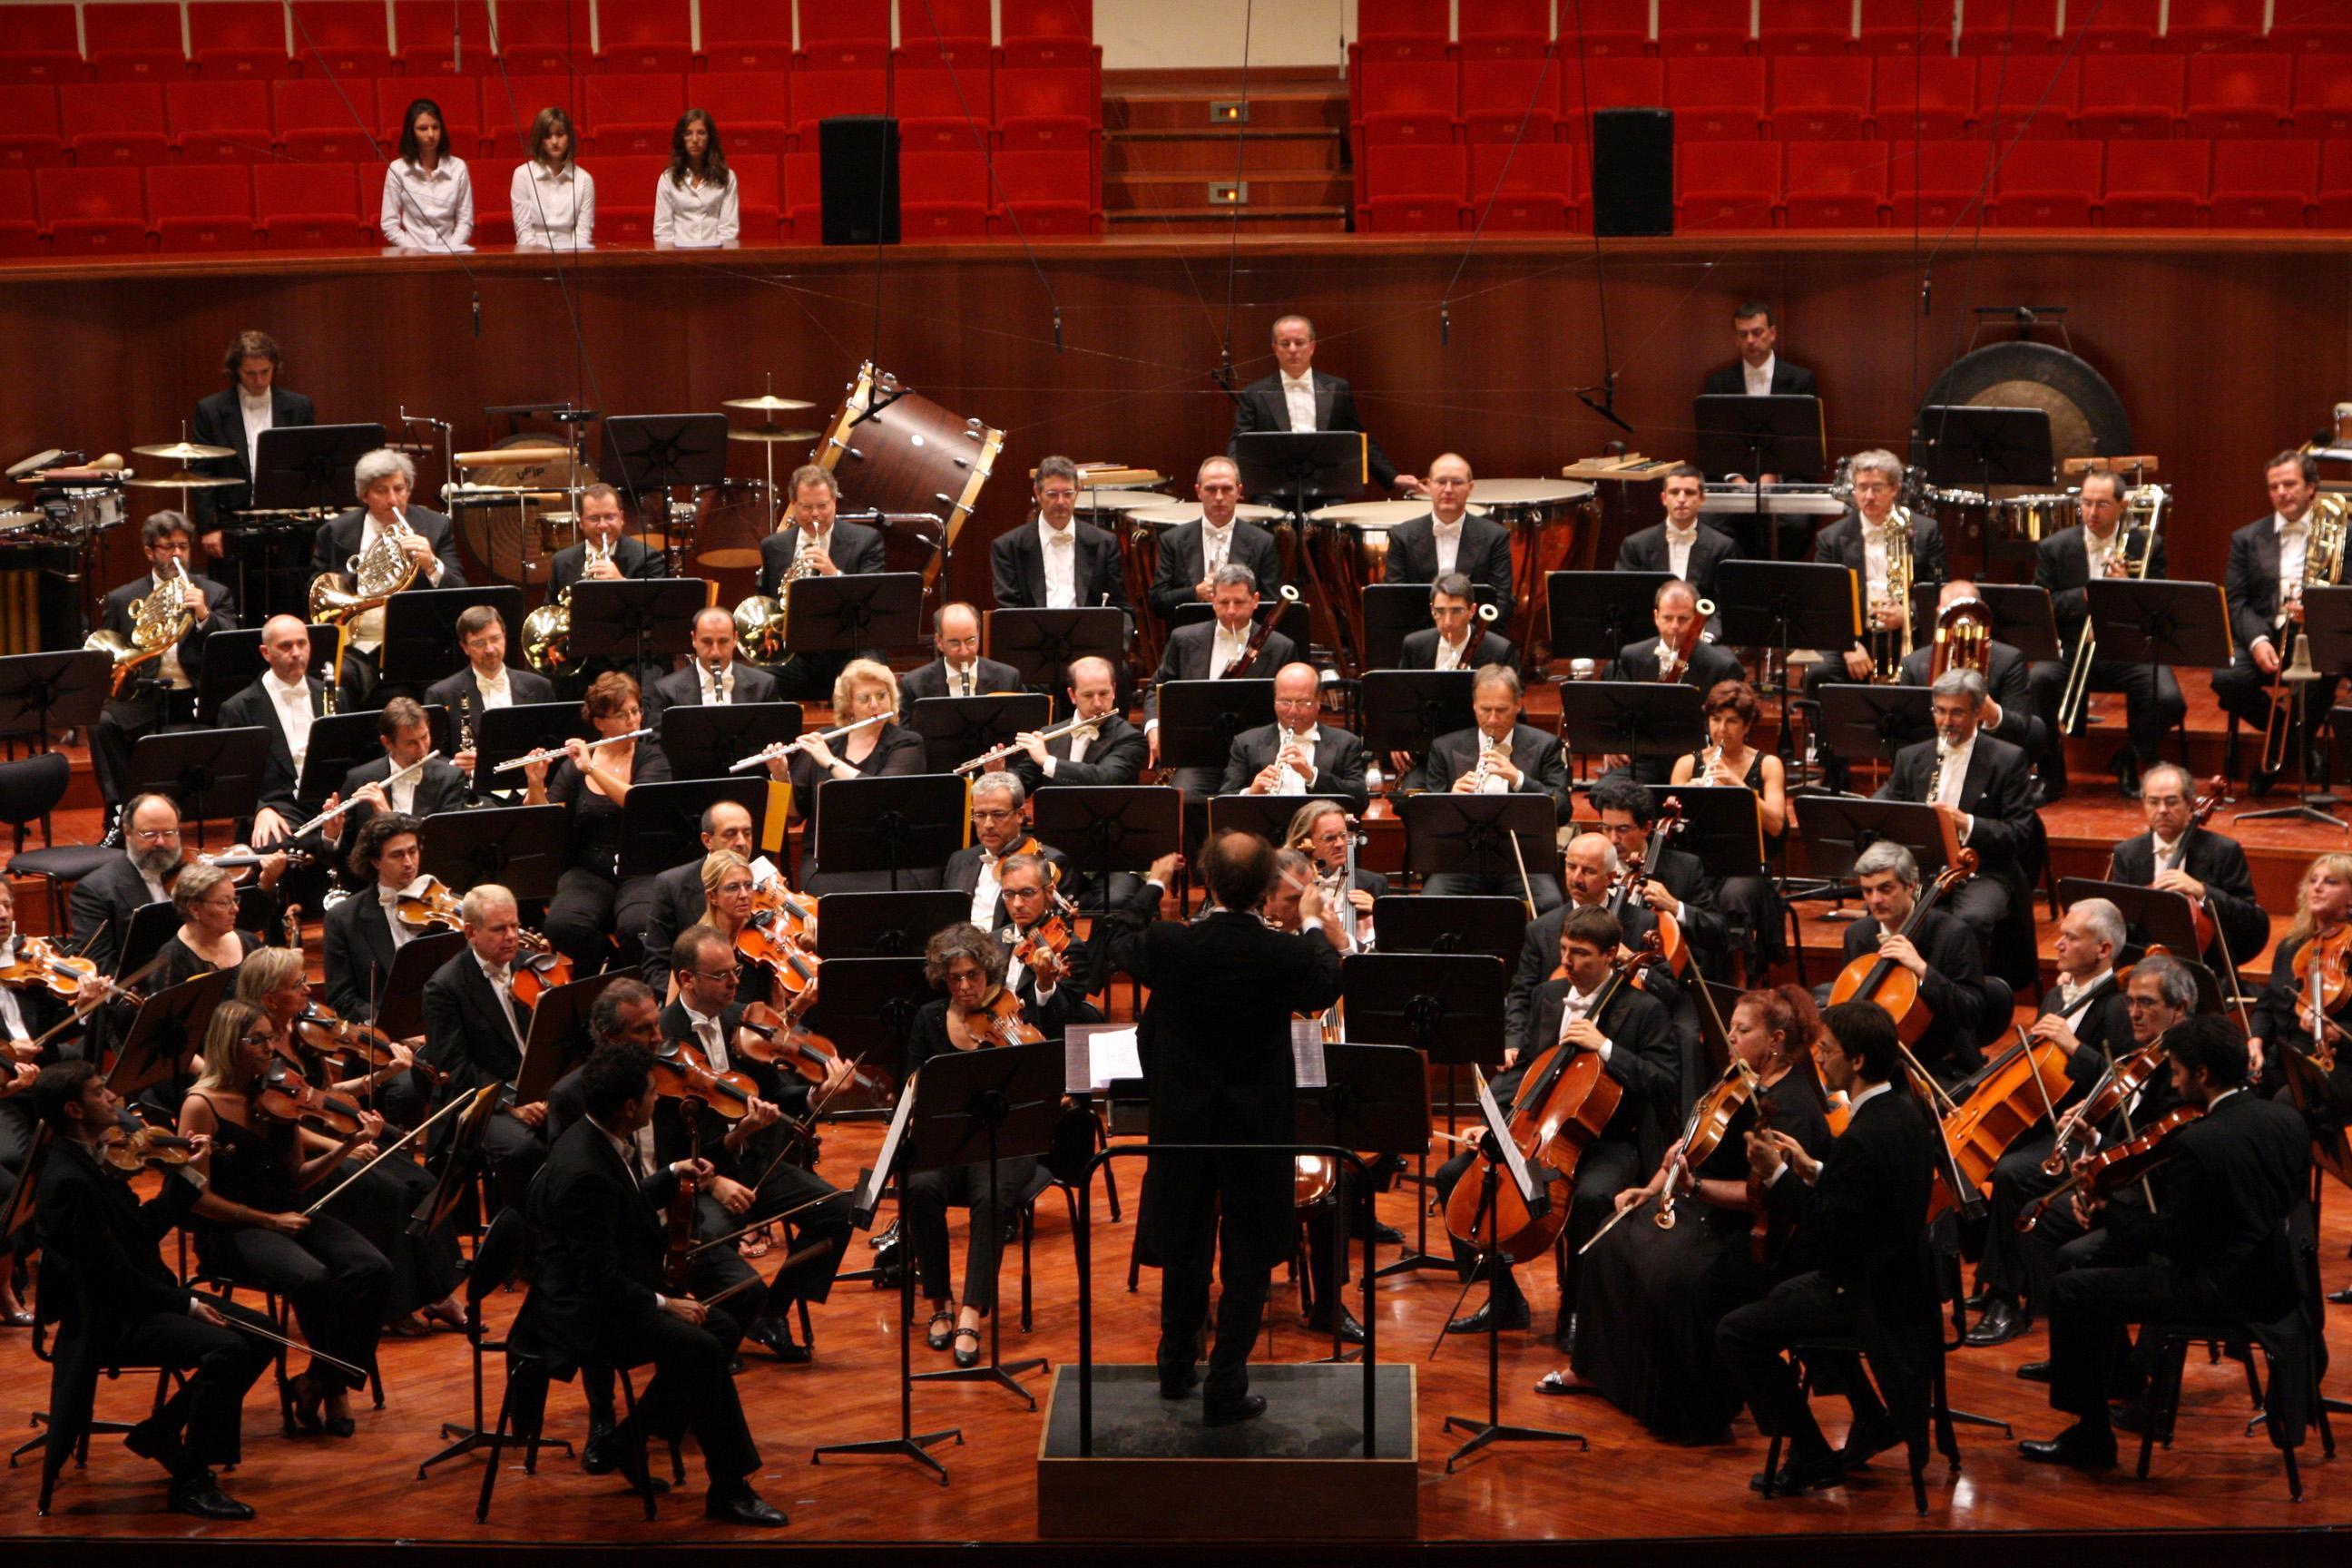 Orchestra Sinfonica Rai